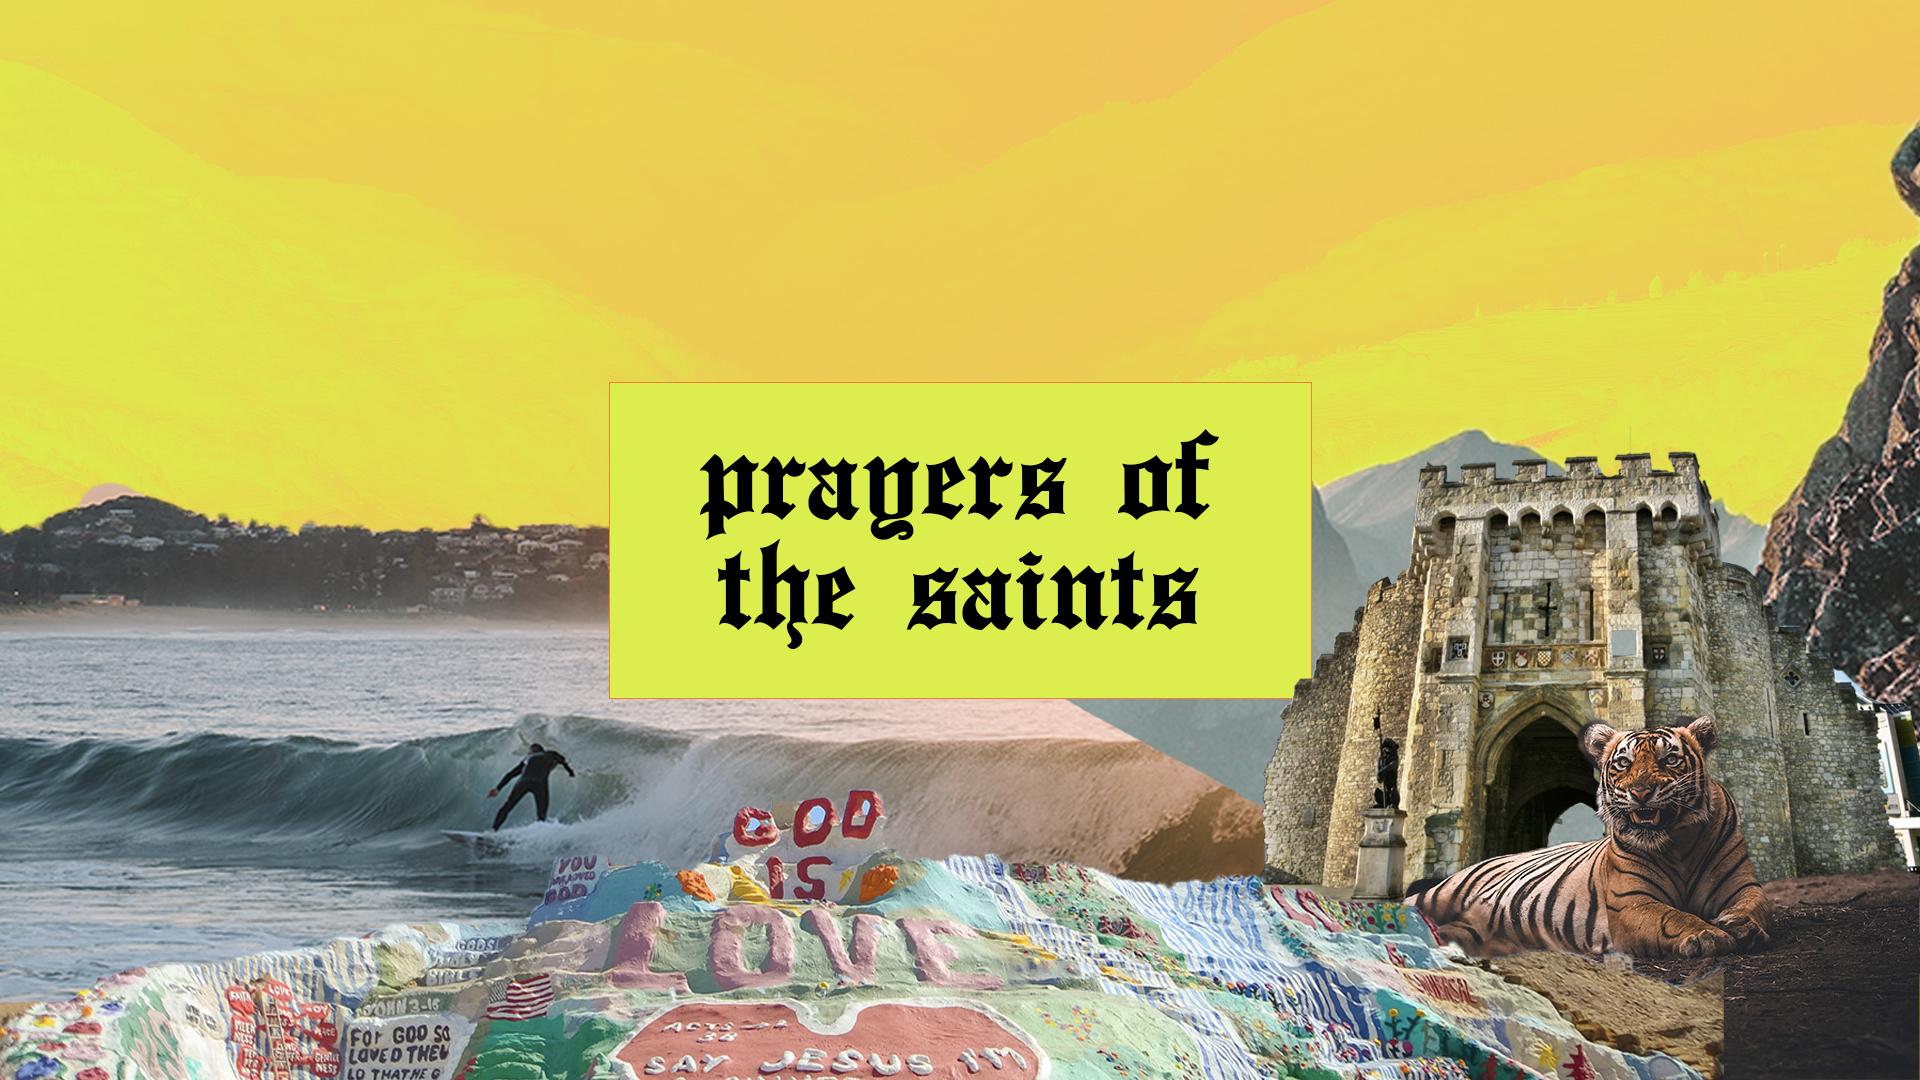 prayerseriestitlepic.jpeg